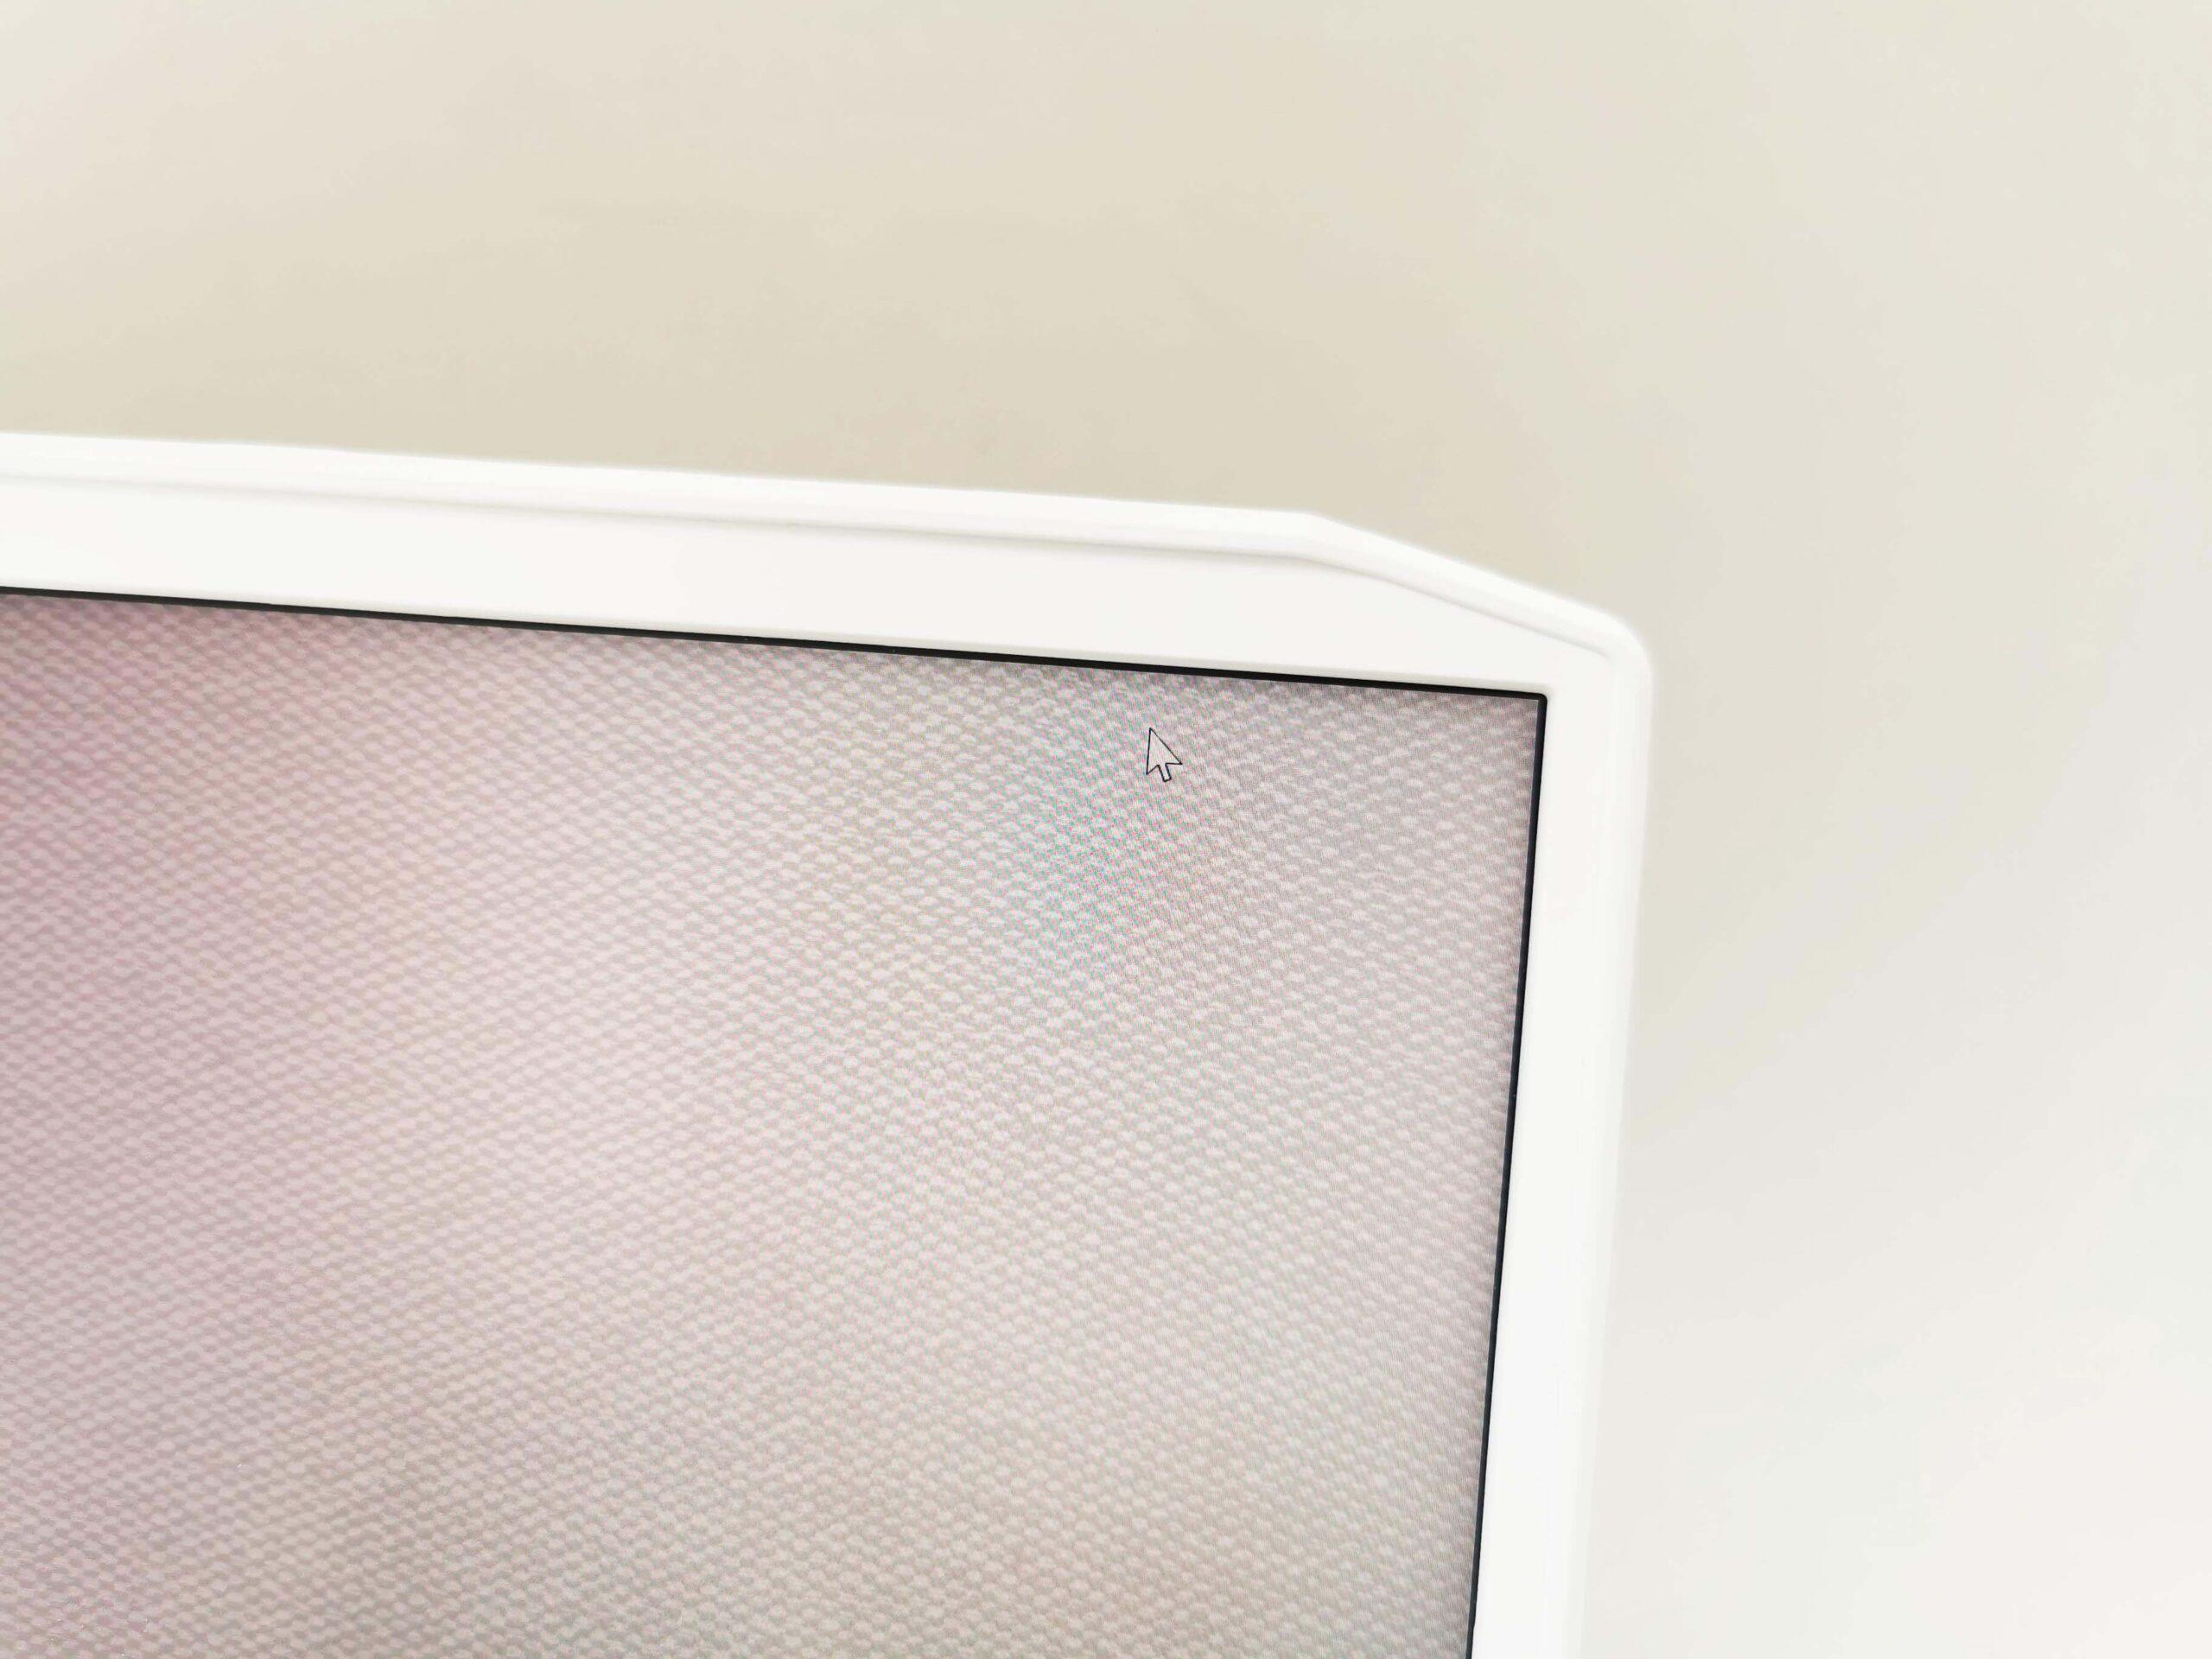 Acer ConceptD 7 Review Romana si Pareri - 2